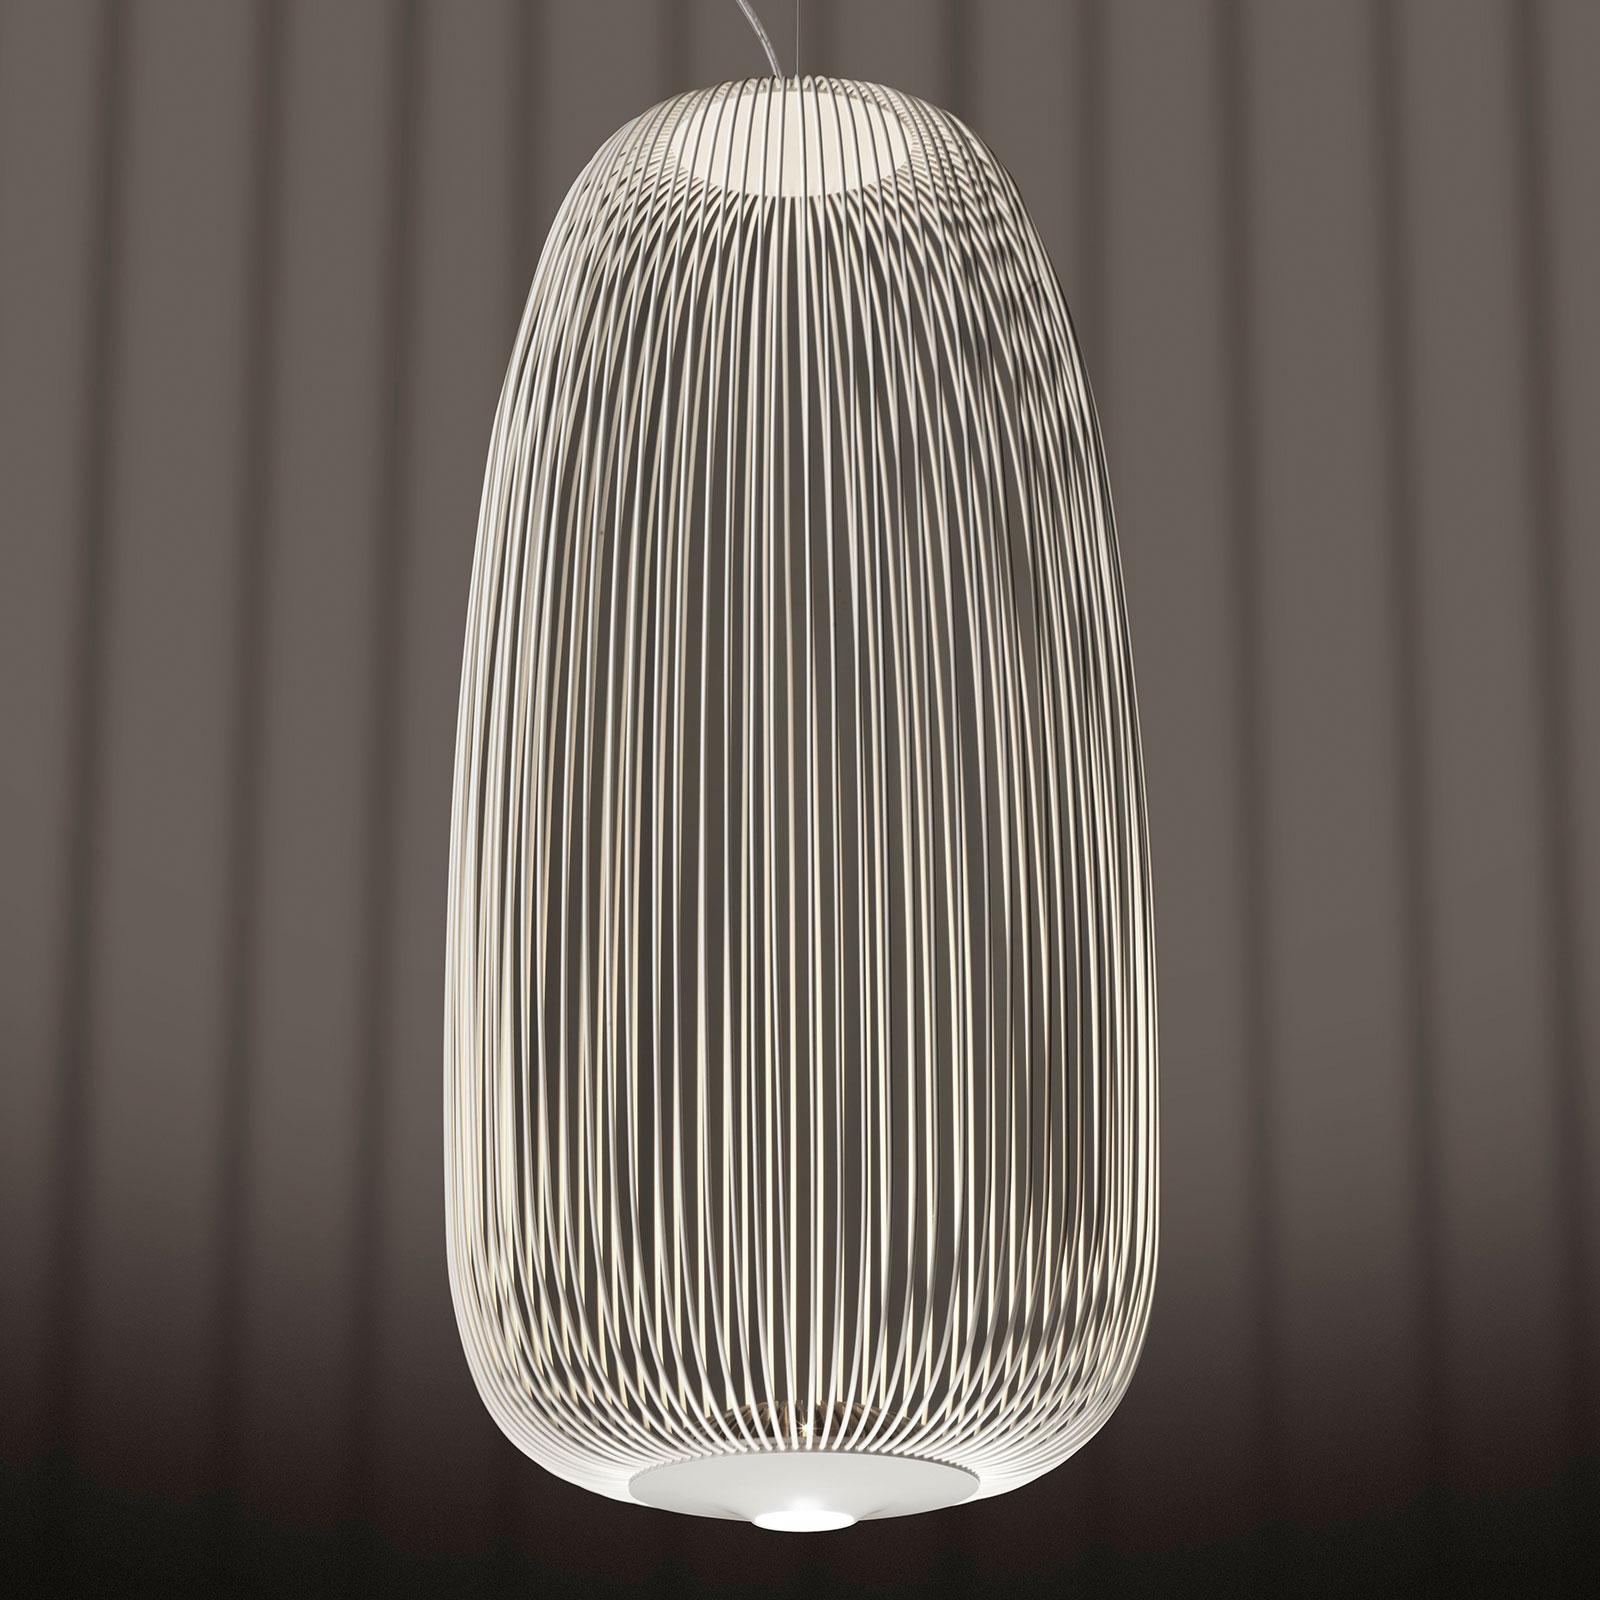 Foscarini Spokes 1 LED-pendellampa, dimbar vit